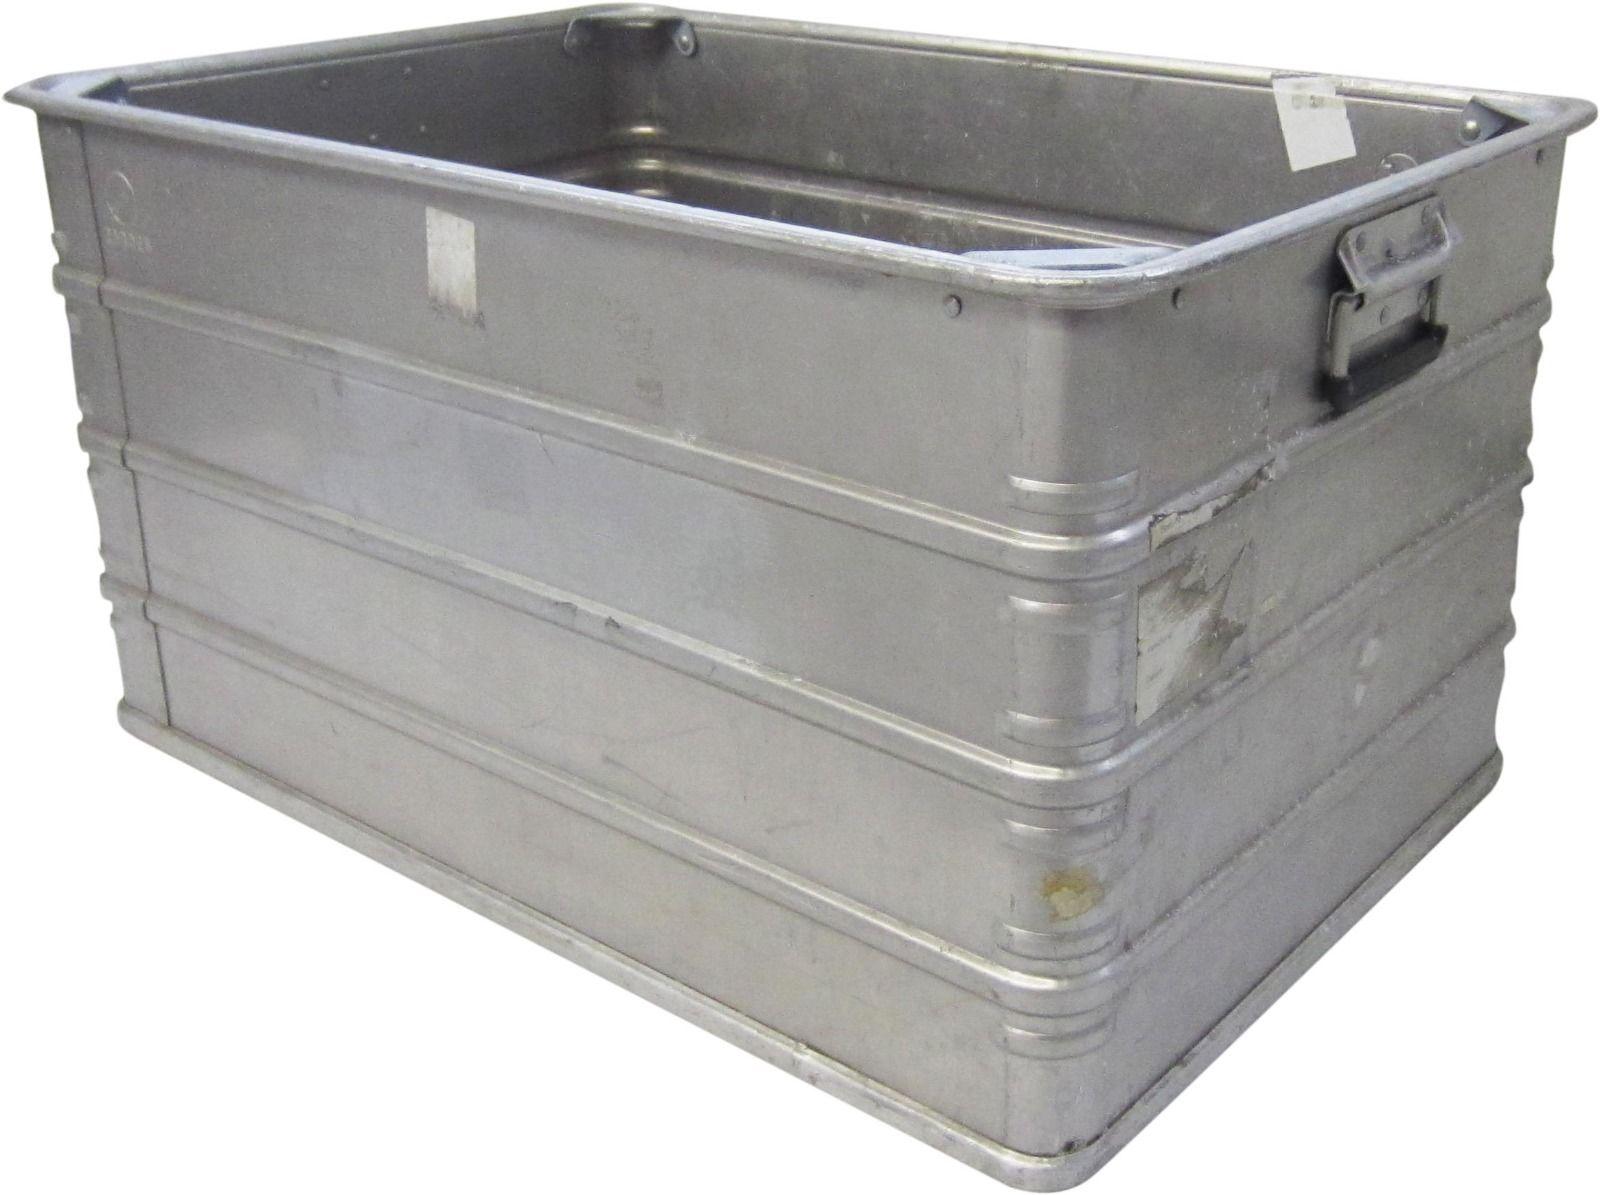 168 liter alubox alu aluminiumkiste transportbox lagerbox. Black Bedroom Furniture Sets. Home Design Ideas